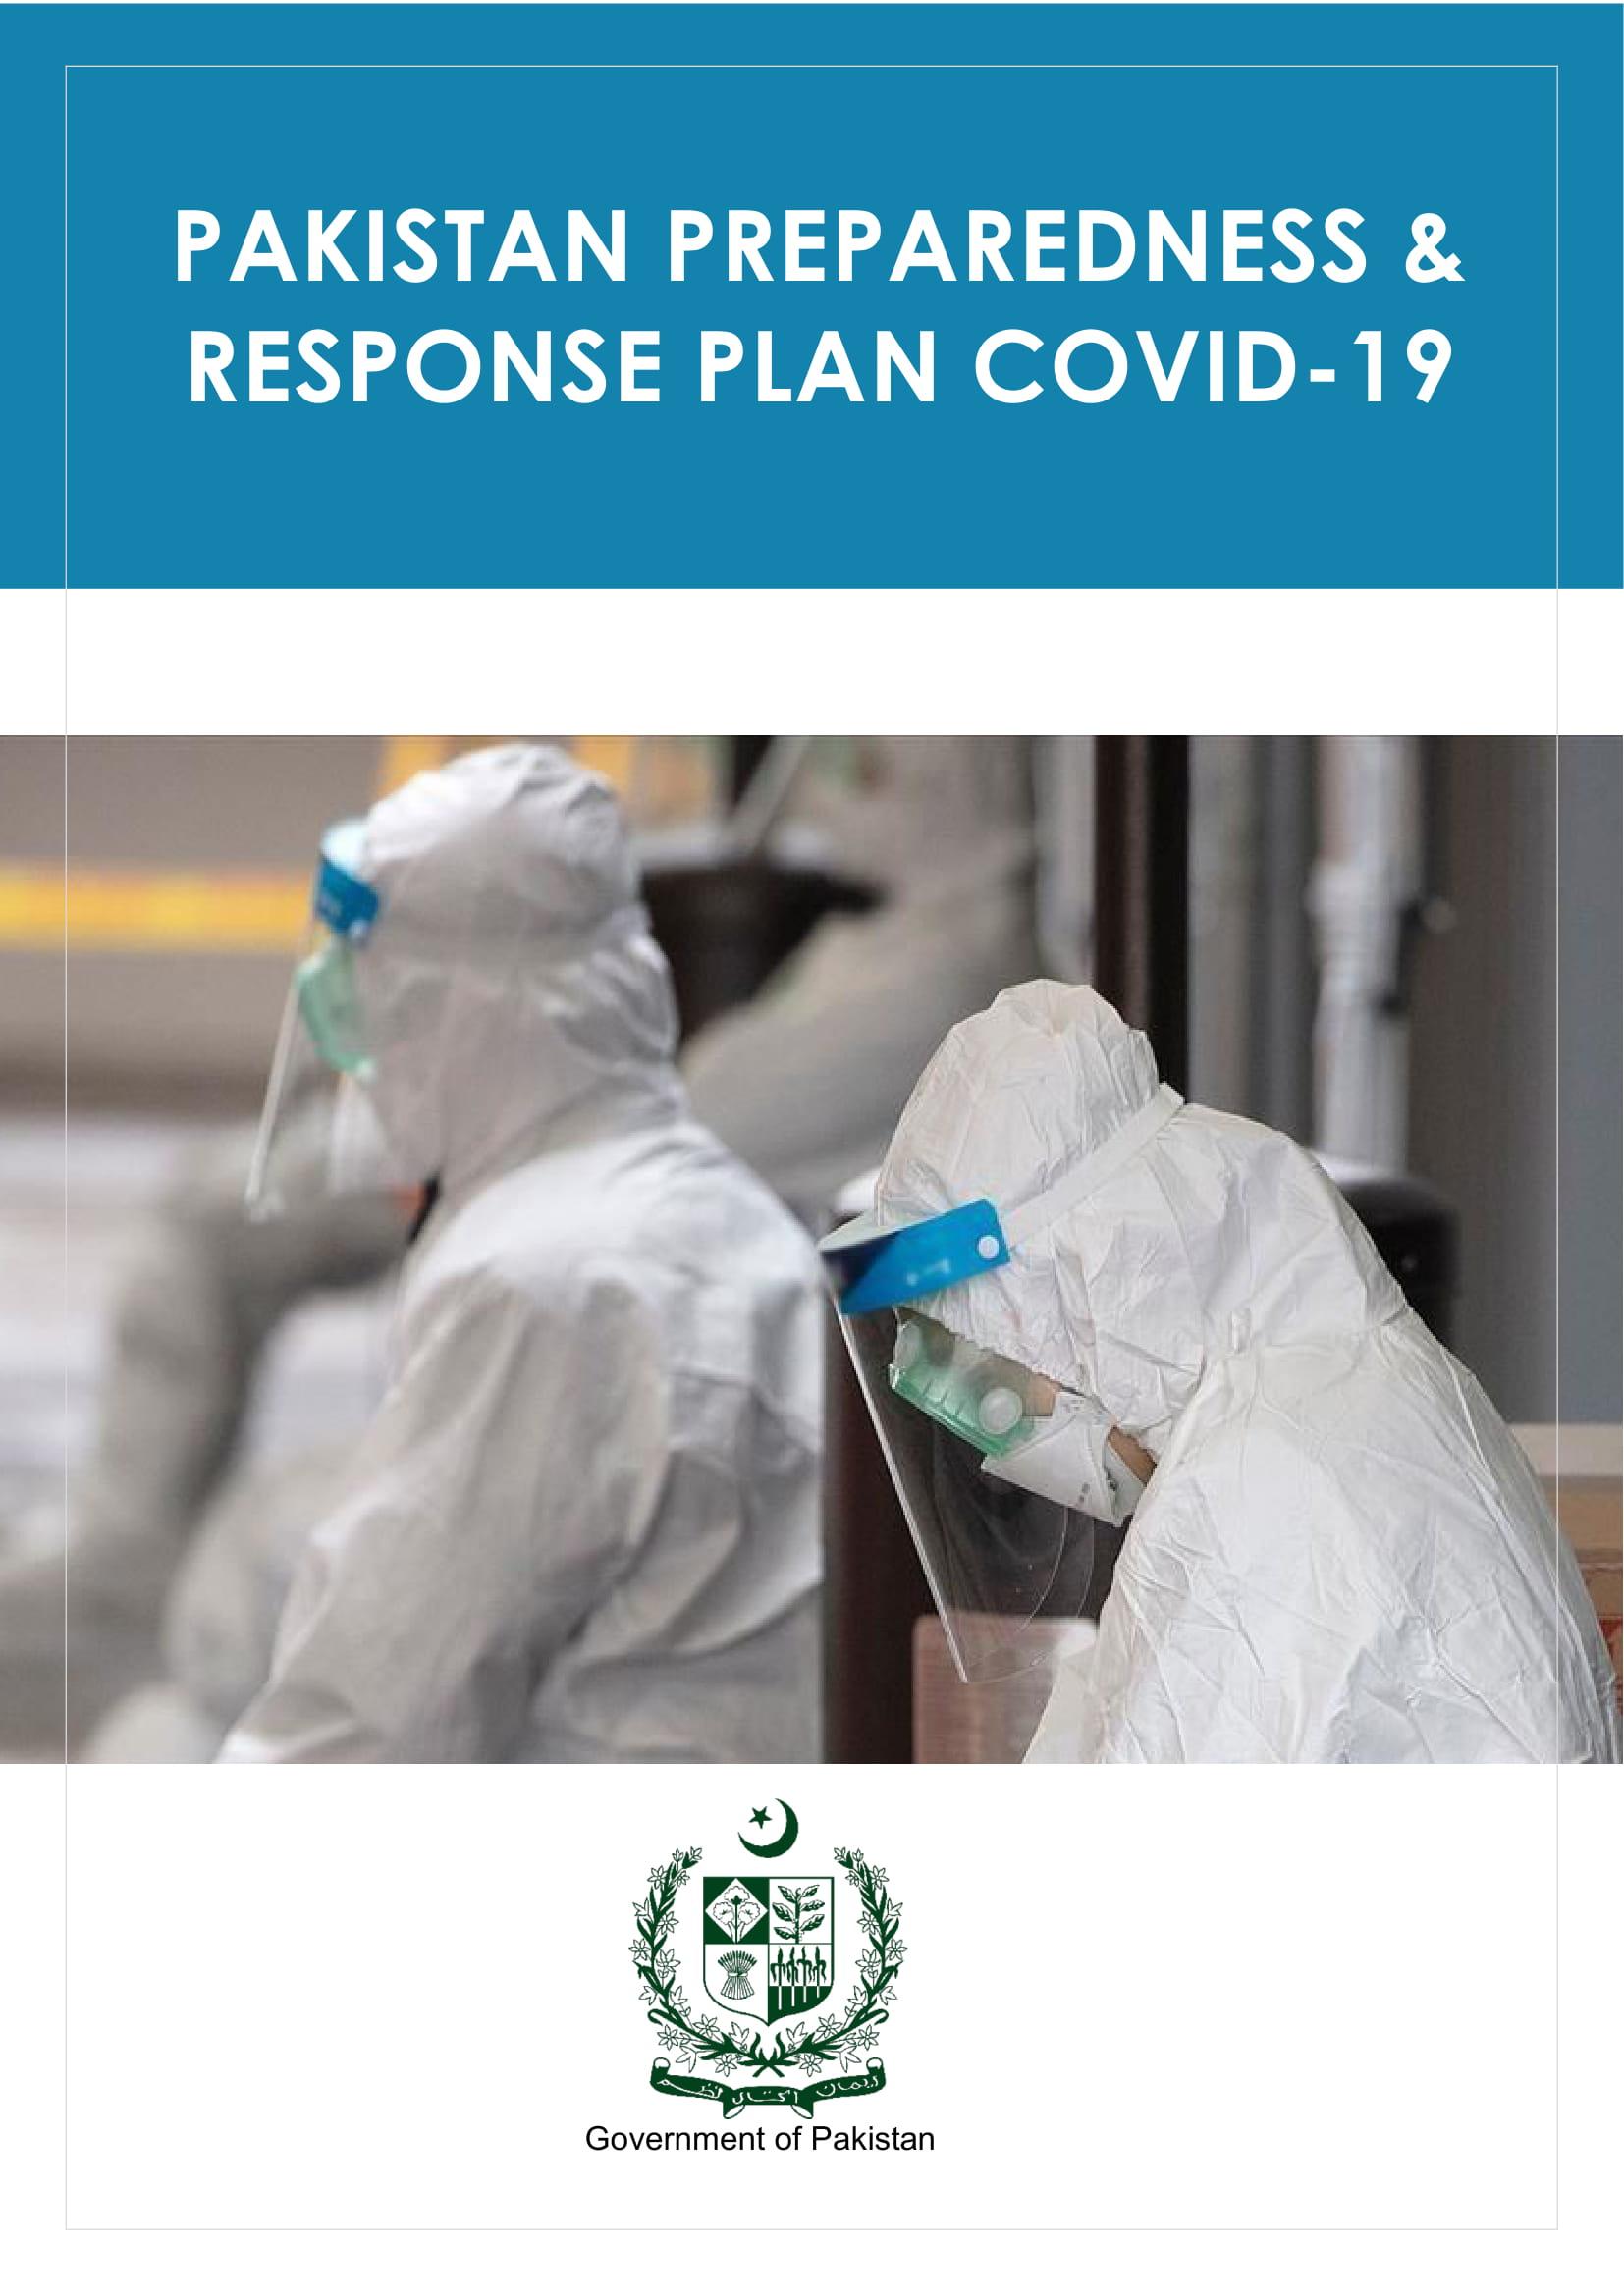 Pakistan Presparedness & Response Plan to COVID-19 (GoP Document)